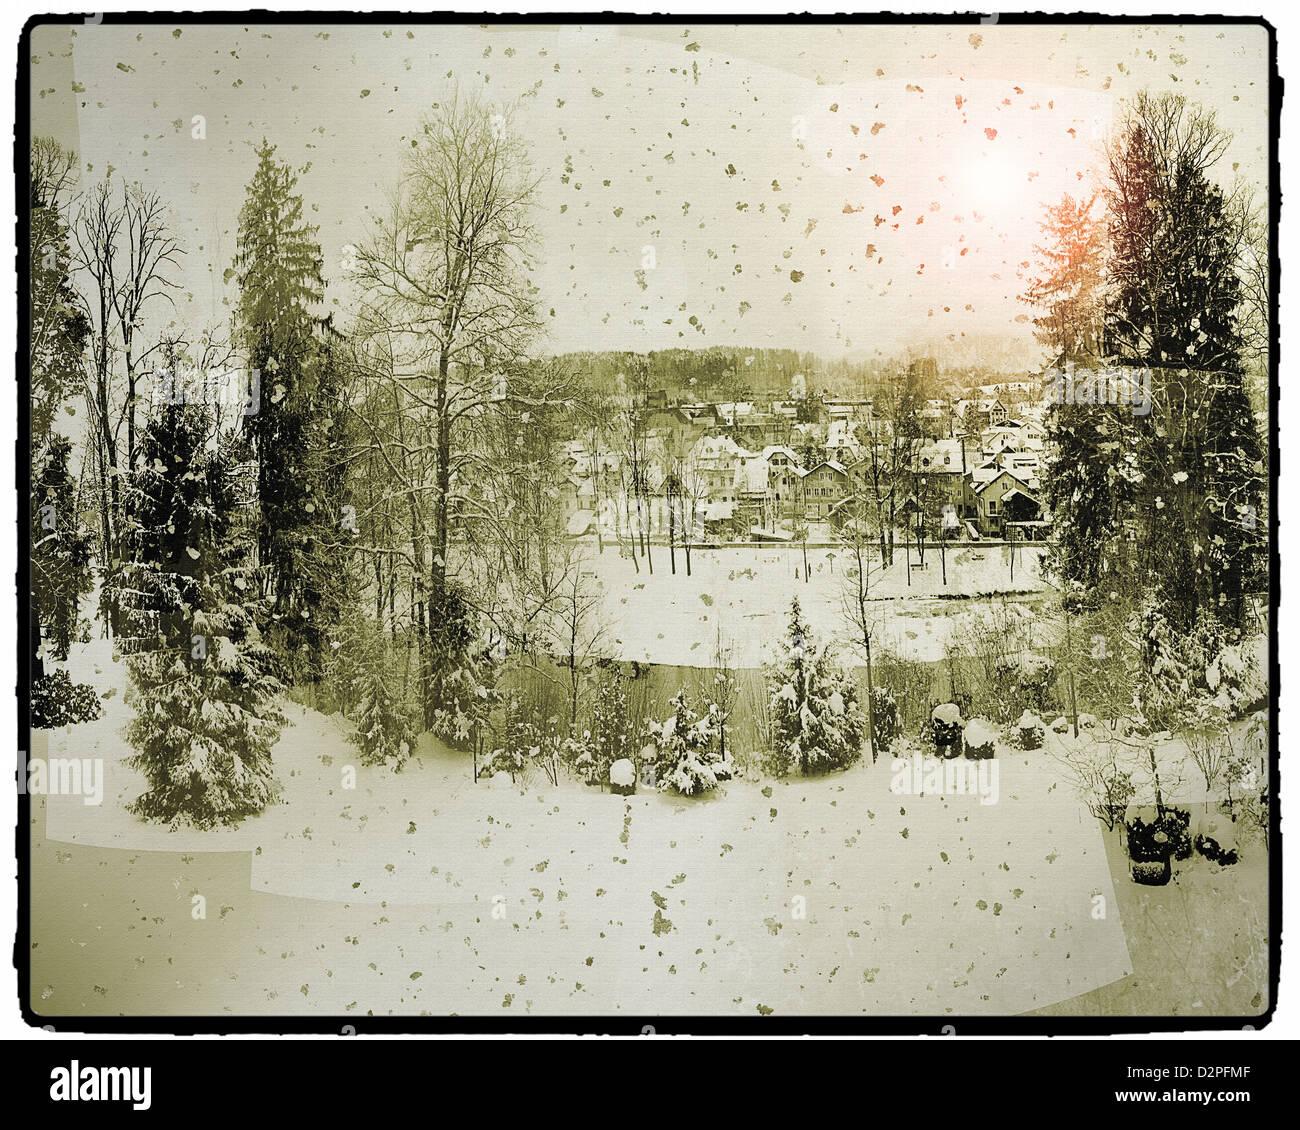 DIGITALE Kunst: Winter Wonderland (Bad Tölz/Bayern Stockfoto, Bild ...